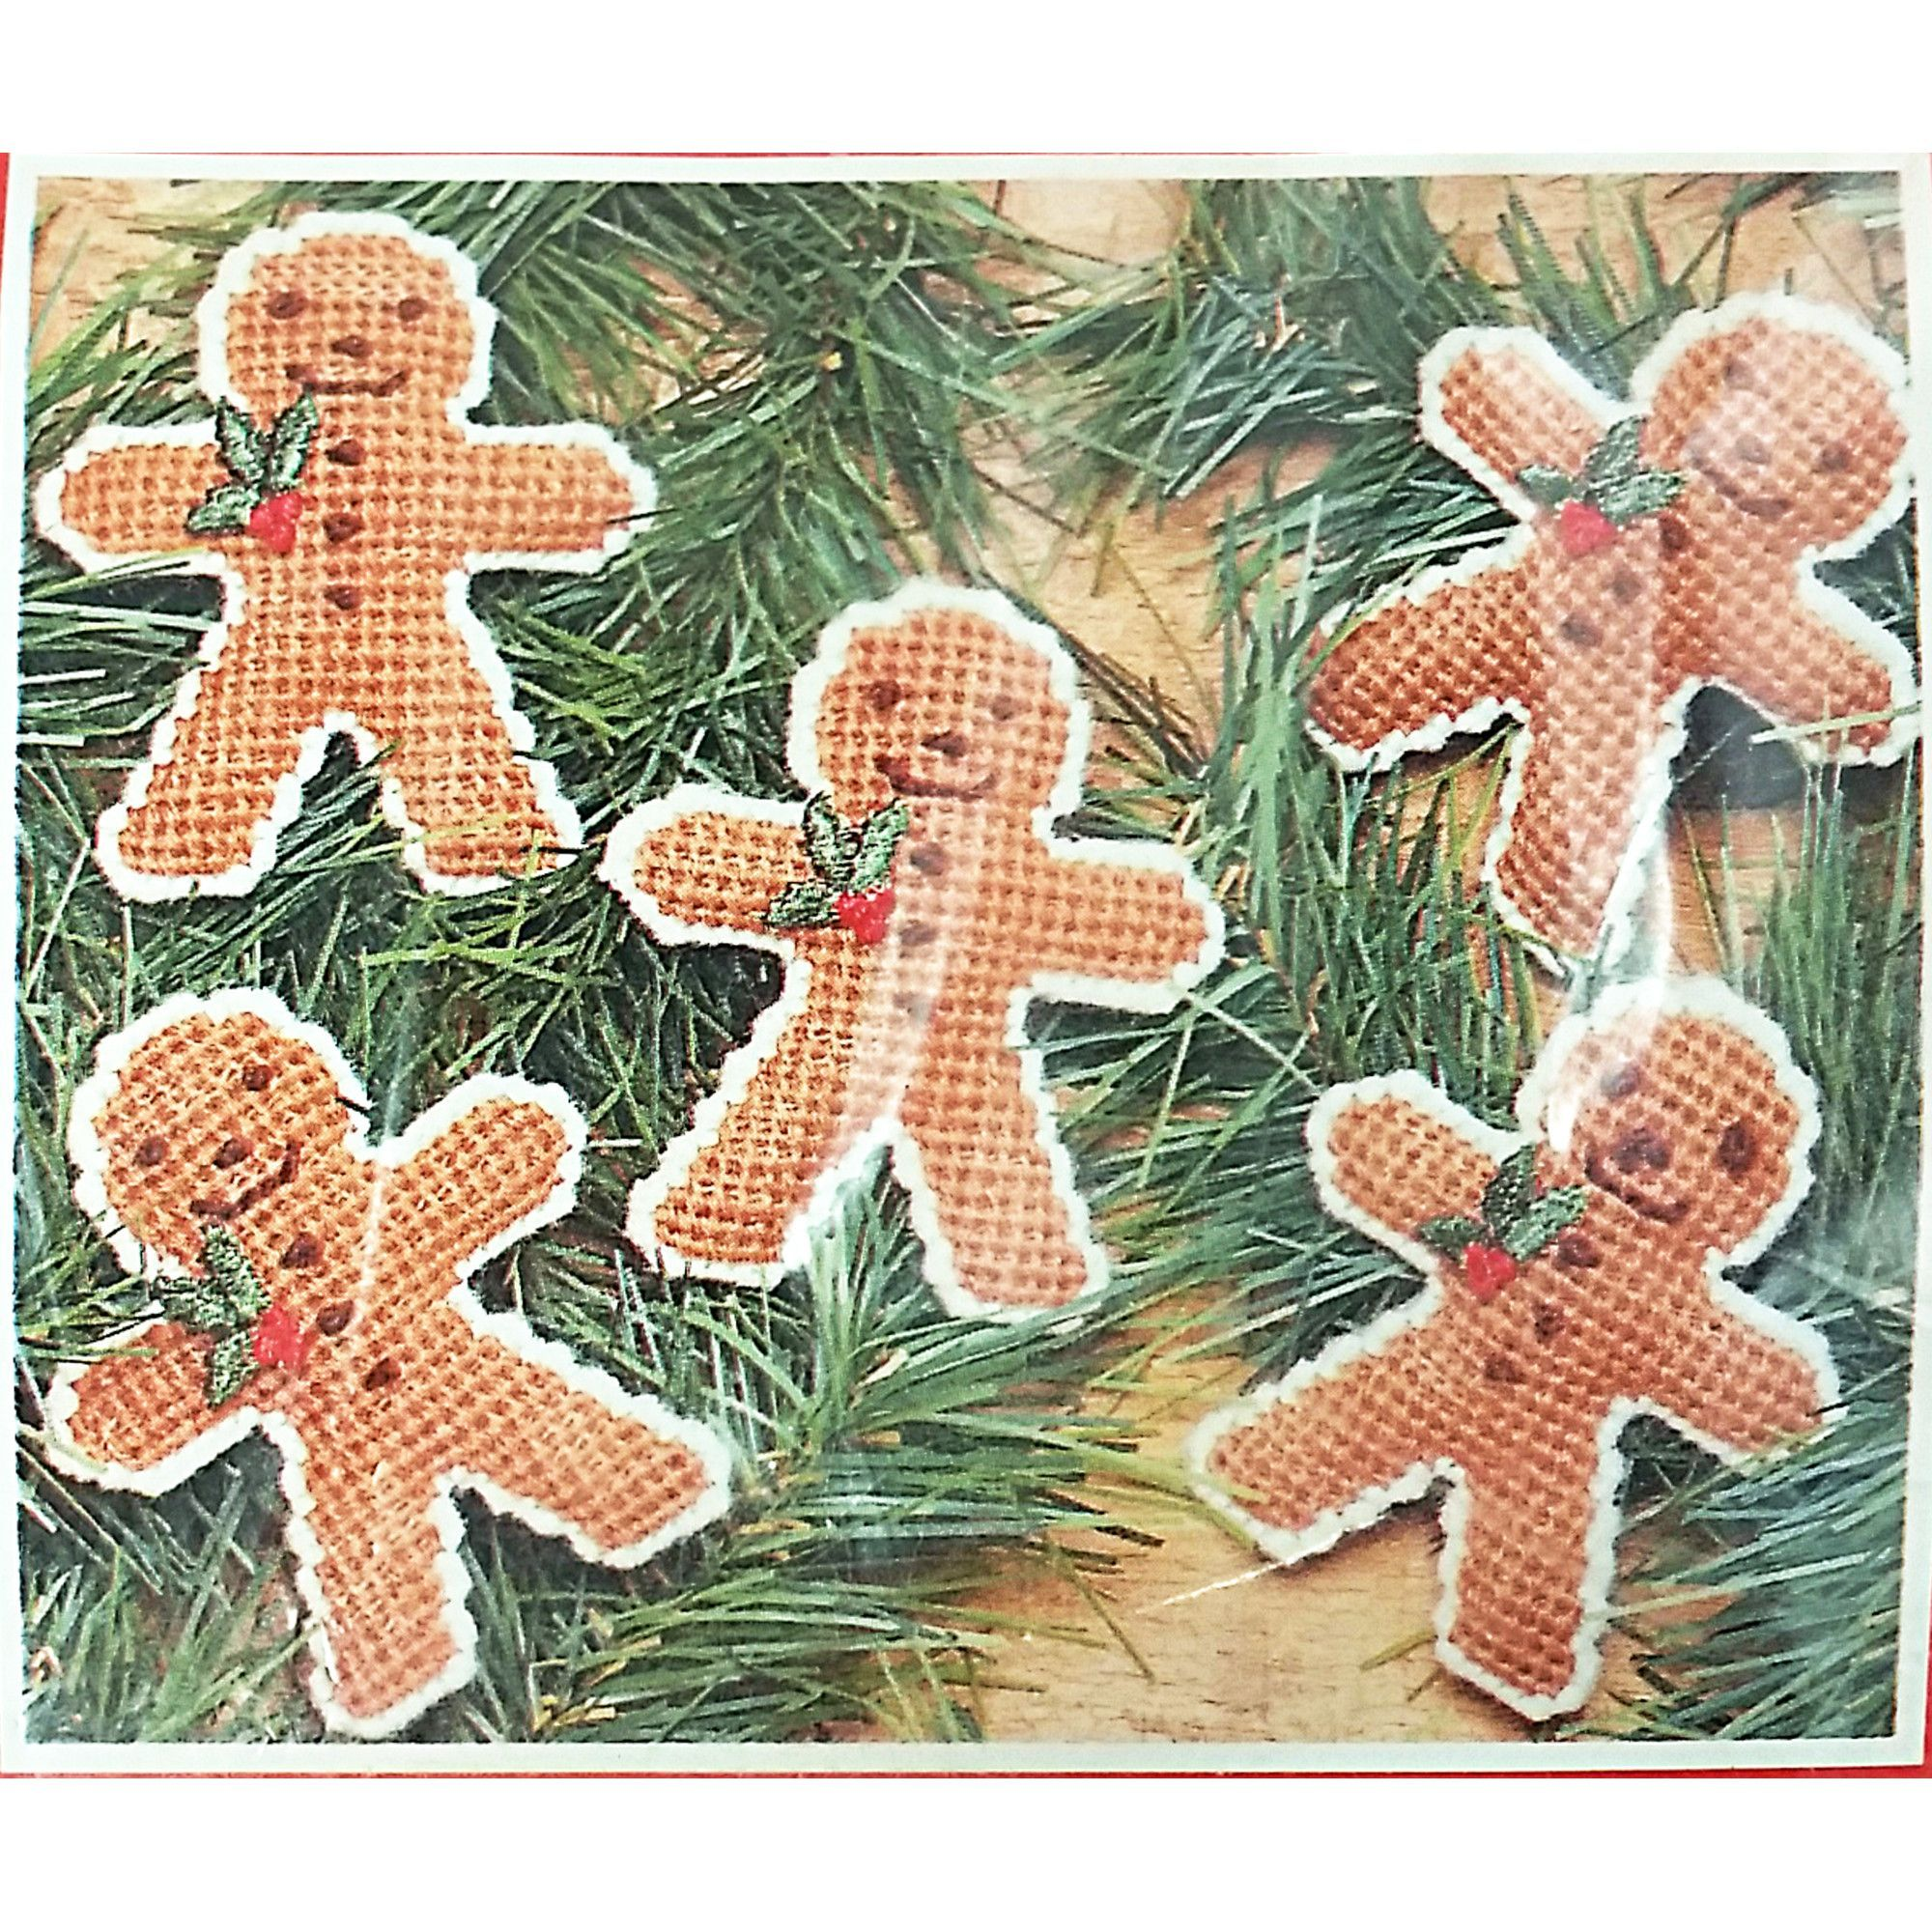 Gingerbread Men Christmas Ornaments Plastic Canvas Kit Mary Maxim ...